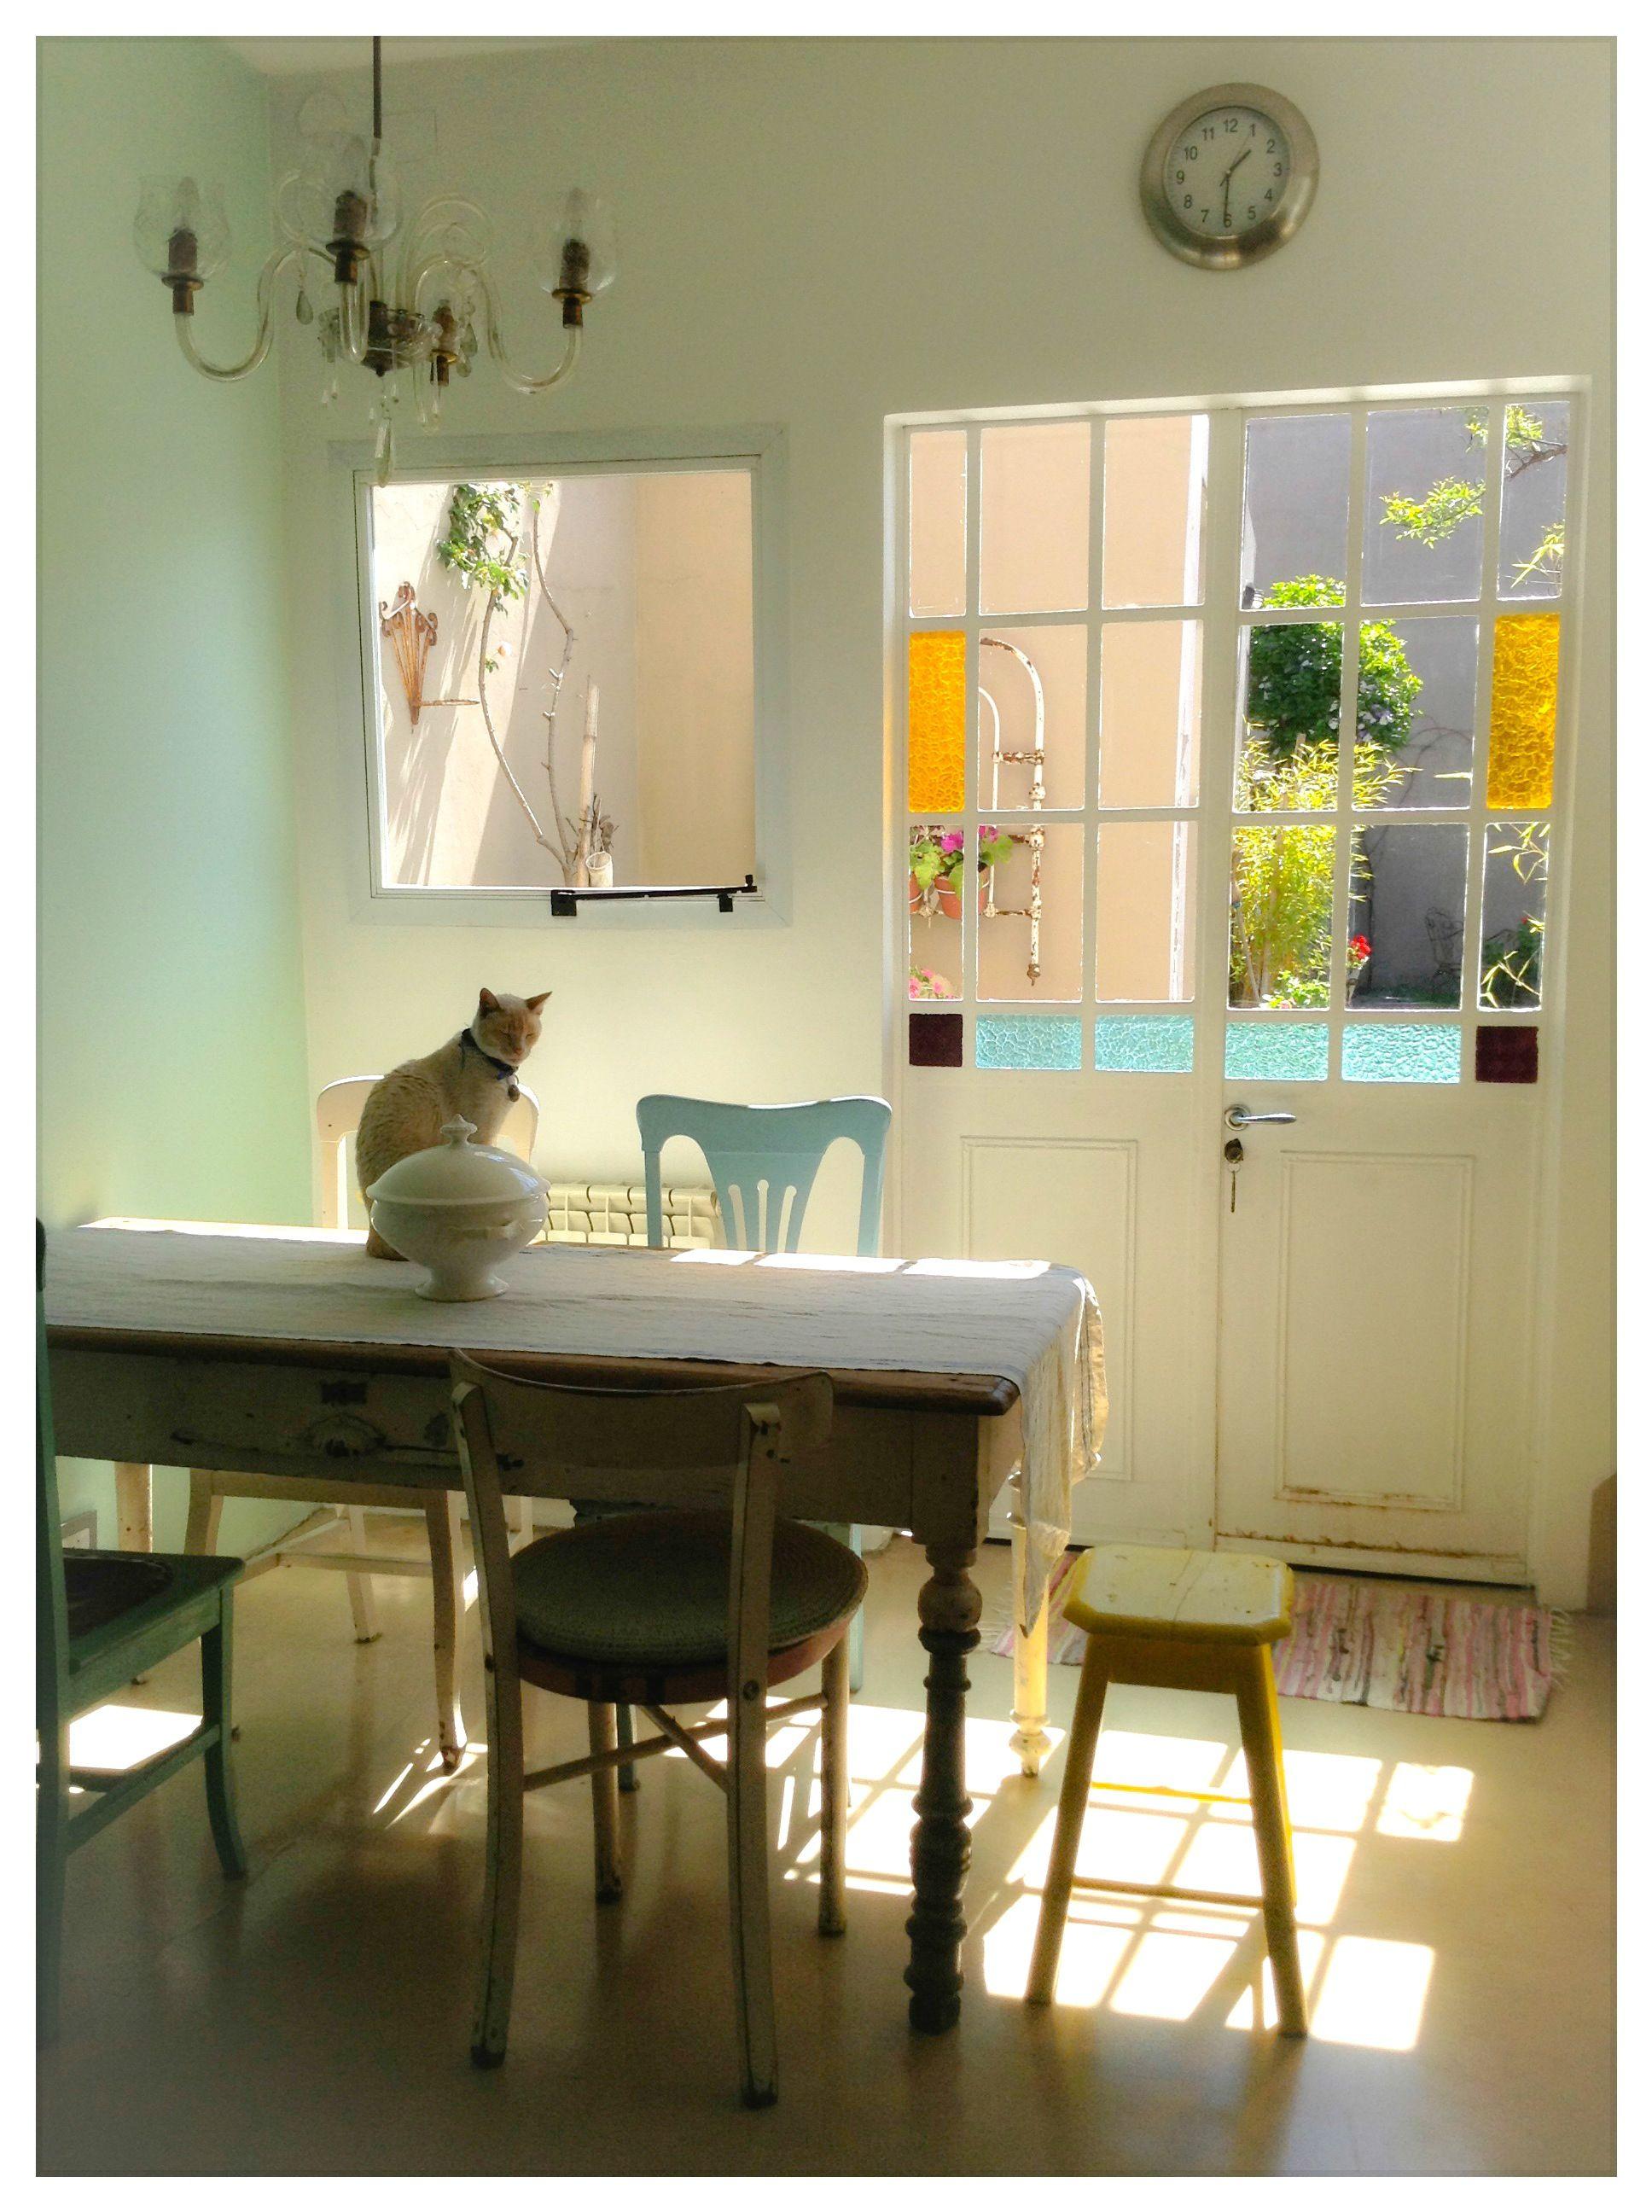 El hermoso comedor diario de marce conti creative home for Comedor diario decoracion